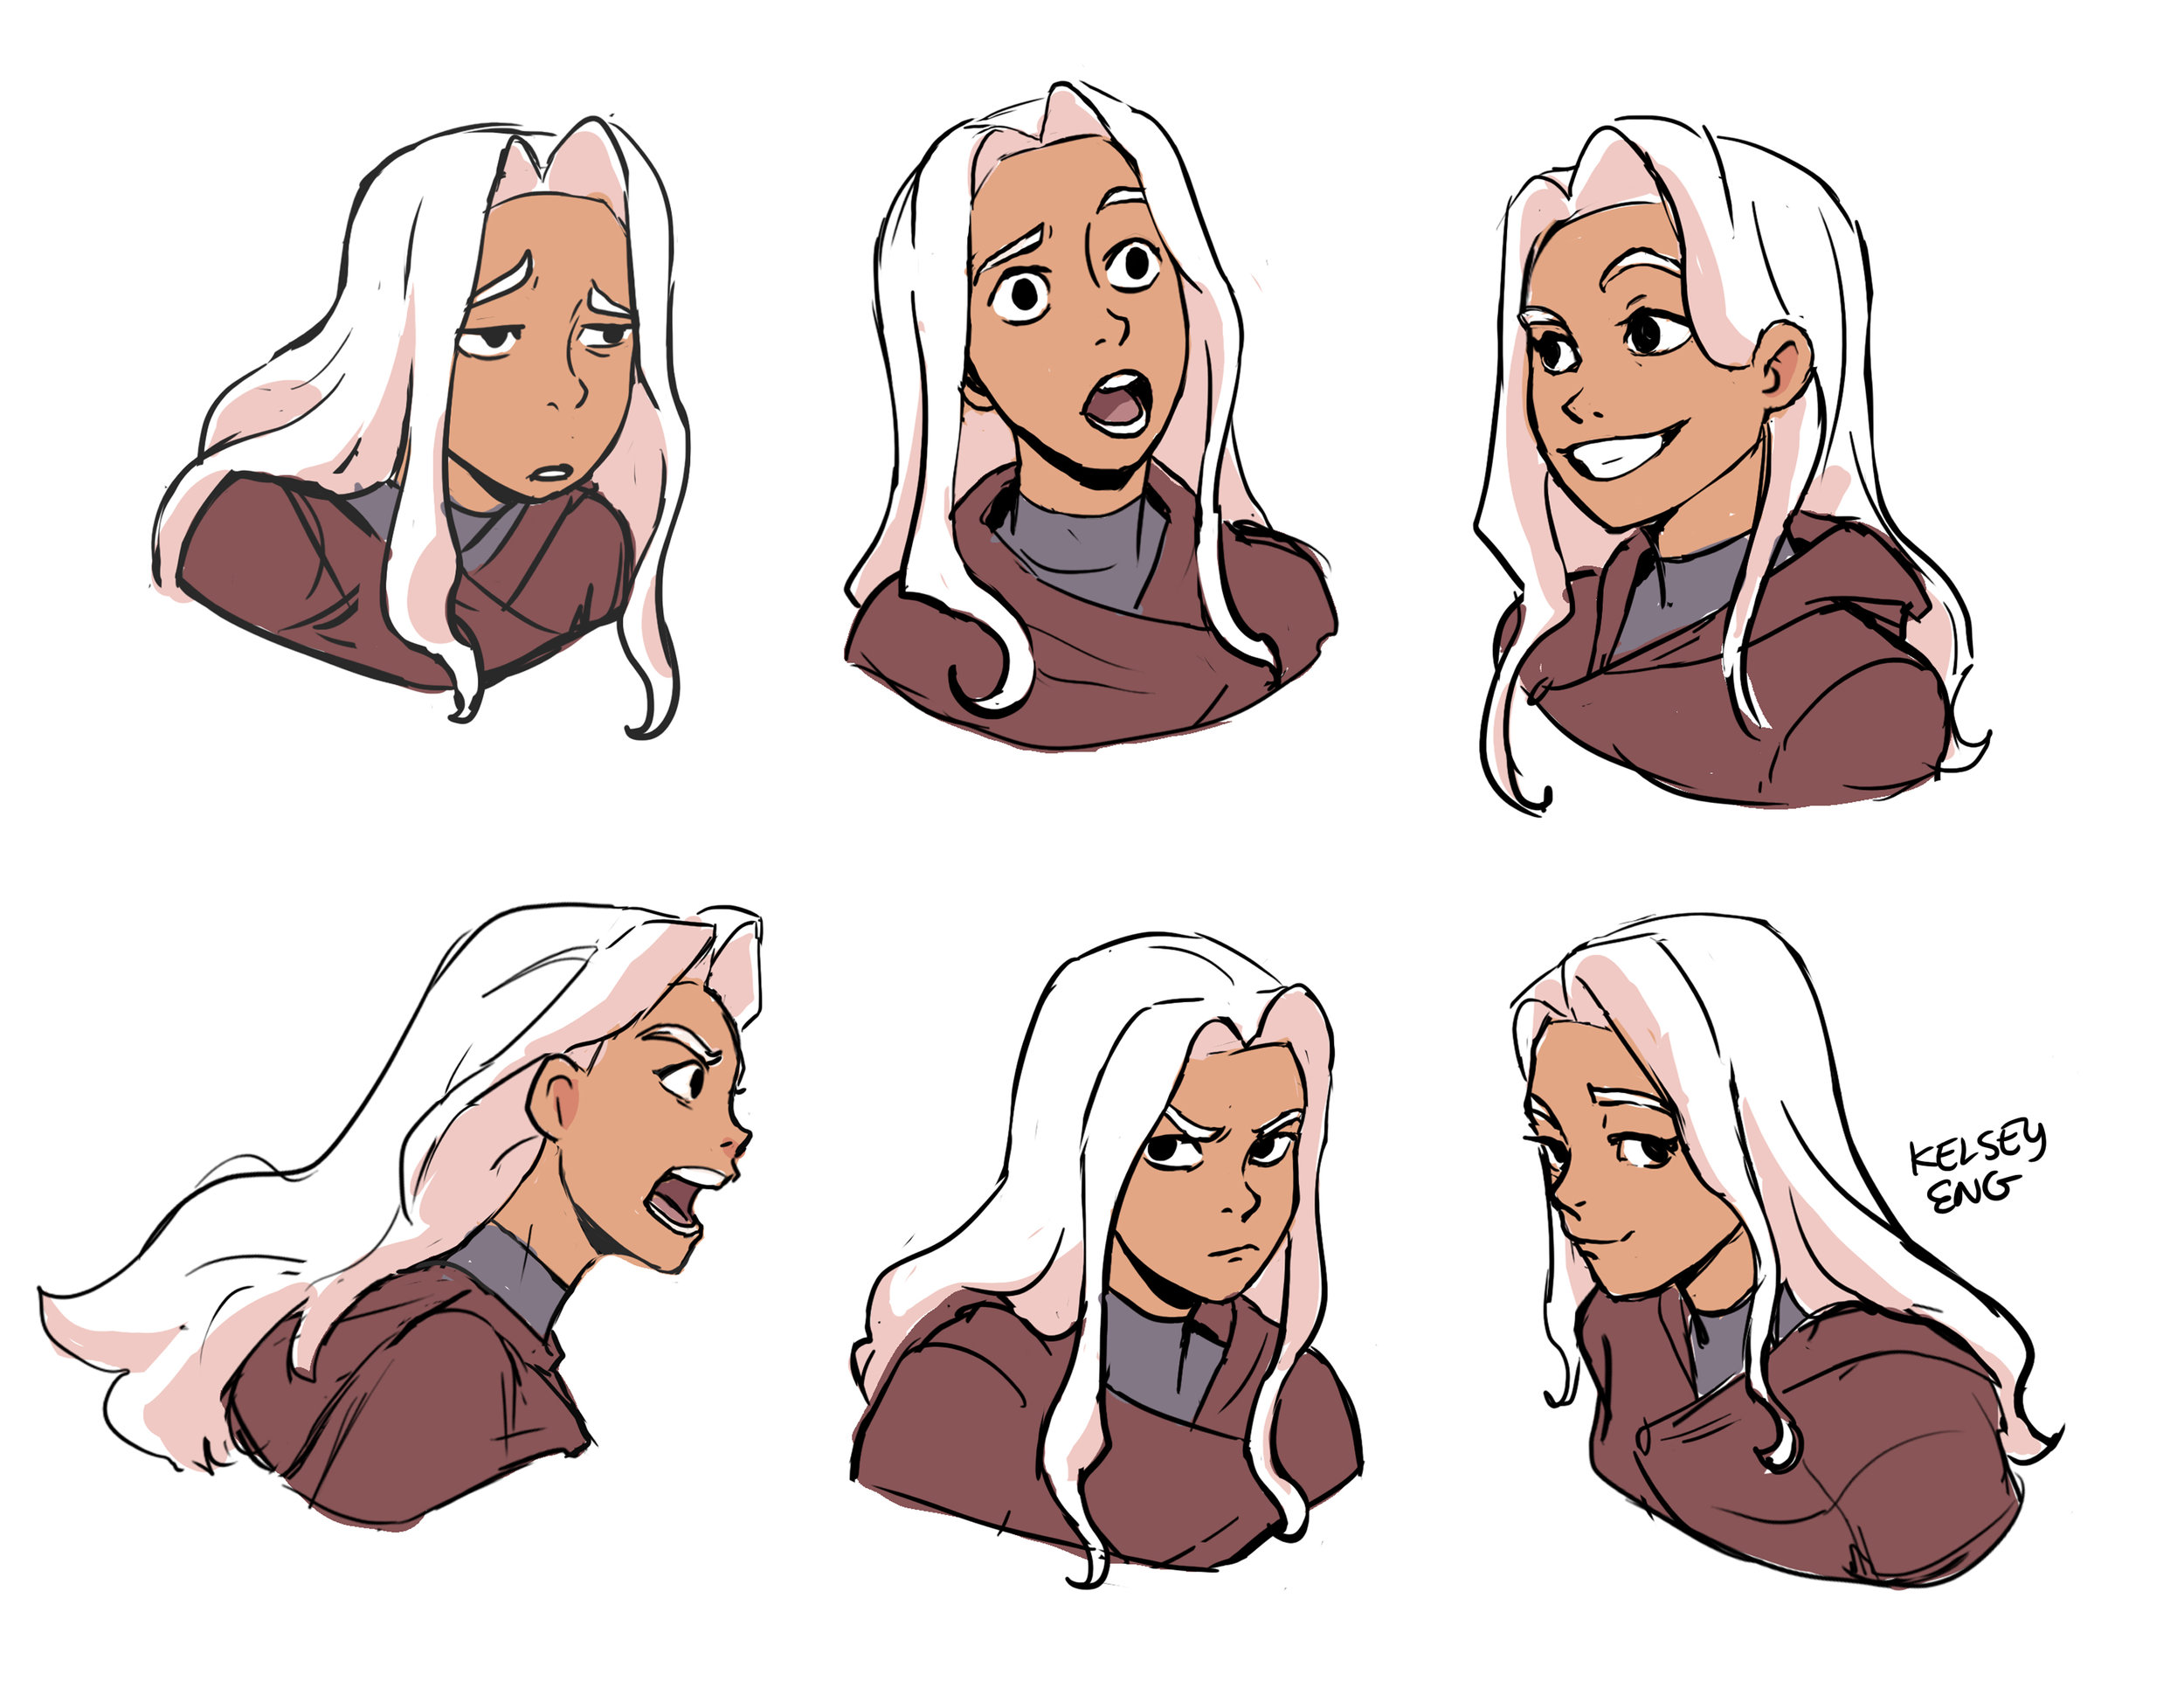 expressions-kelseyeng.jpg